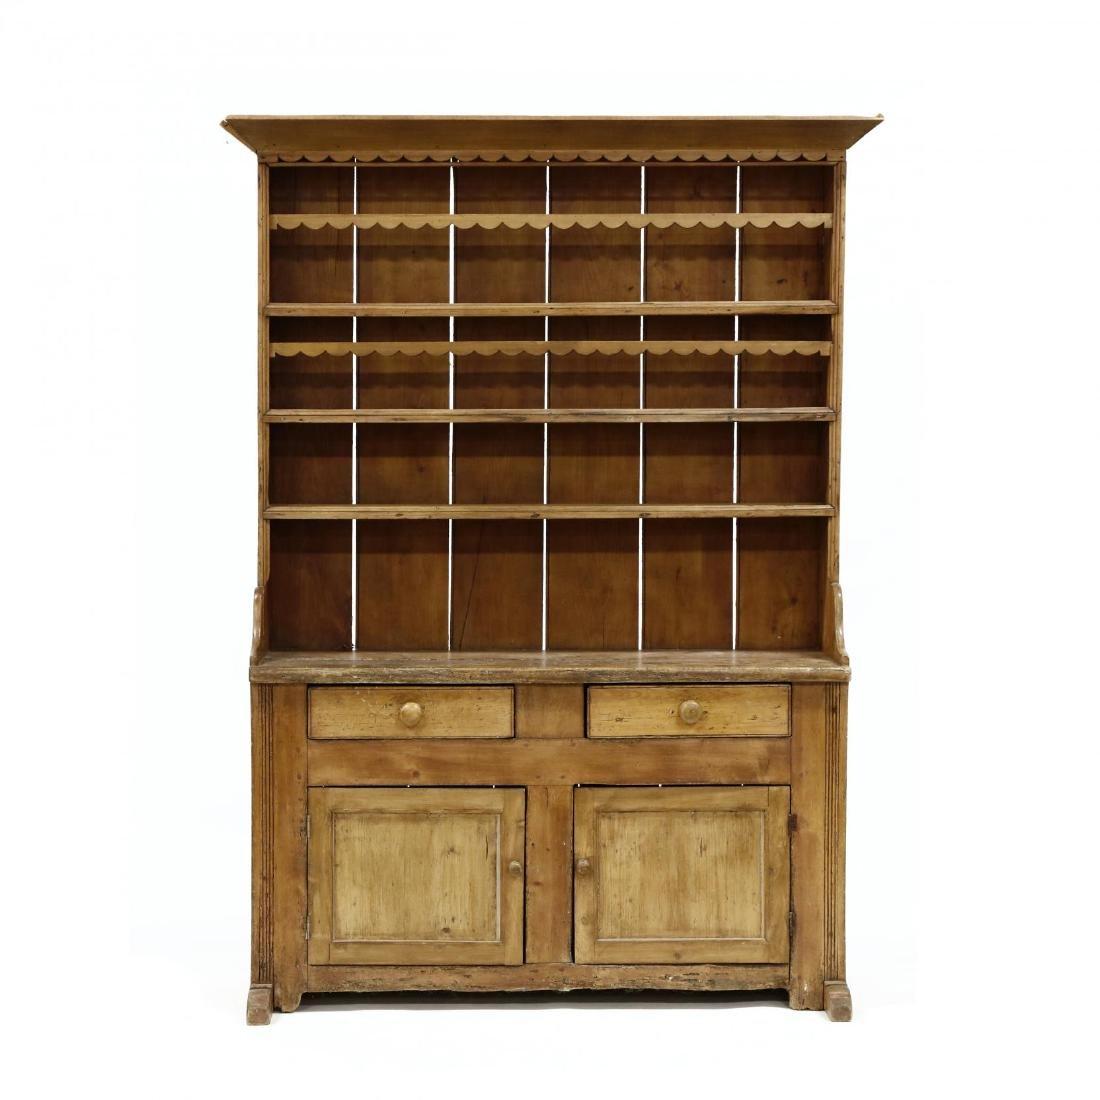 Antique Continental Flatwall Cupboard